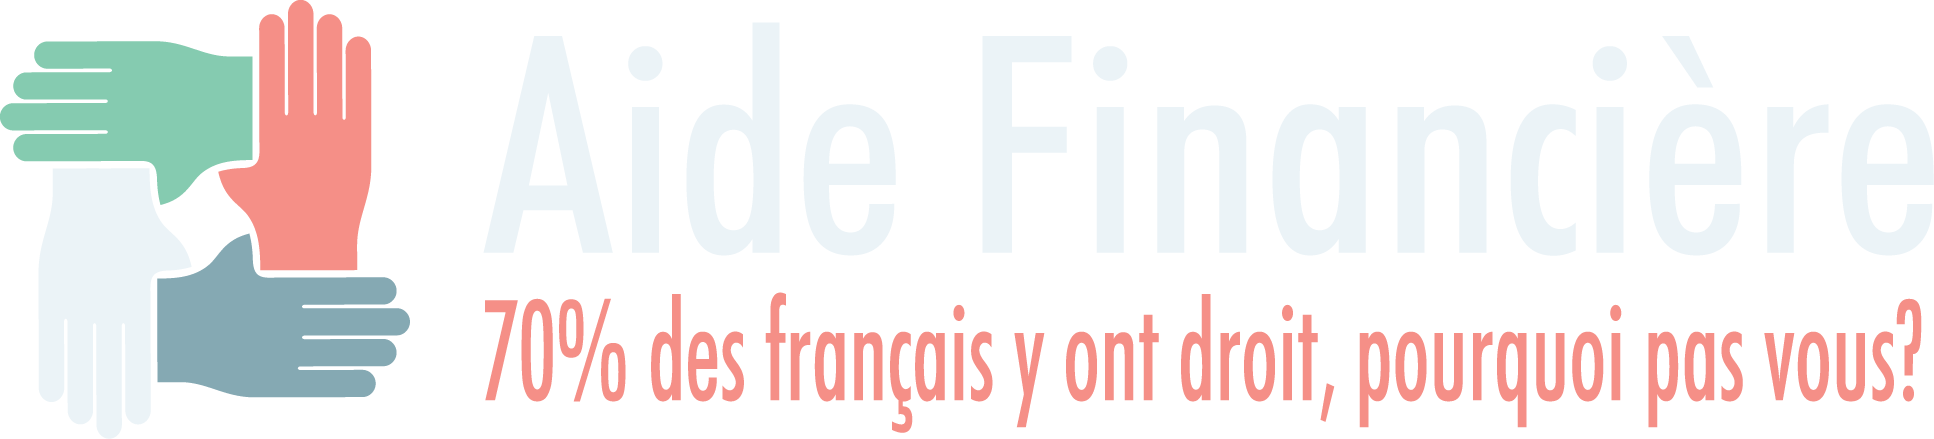 Aide Financiere Caf Reparation Voiture